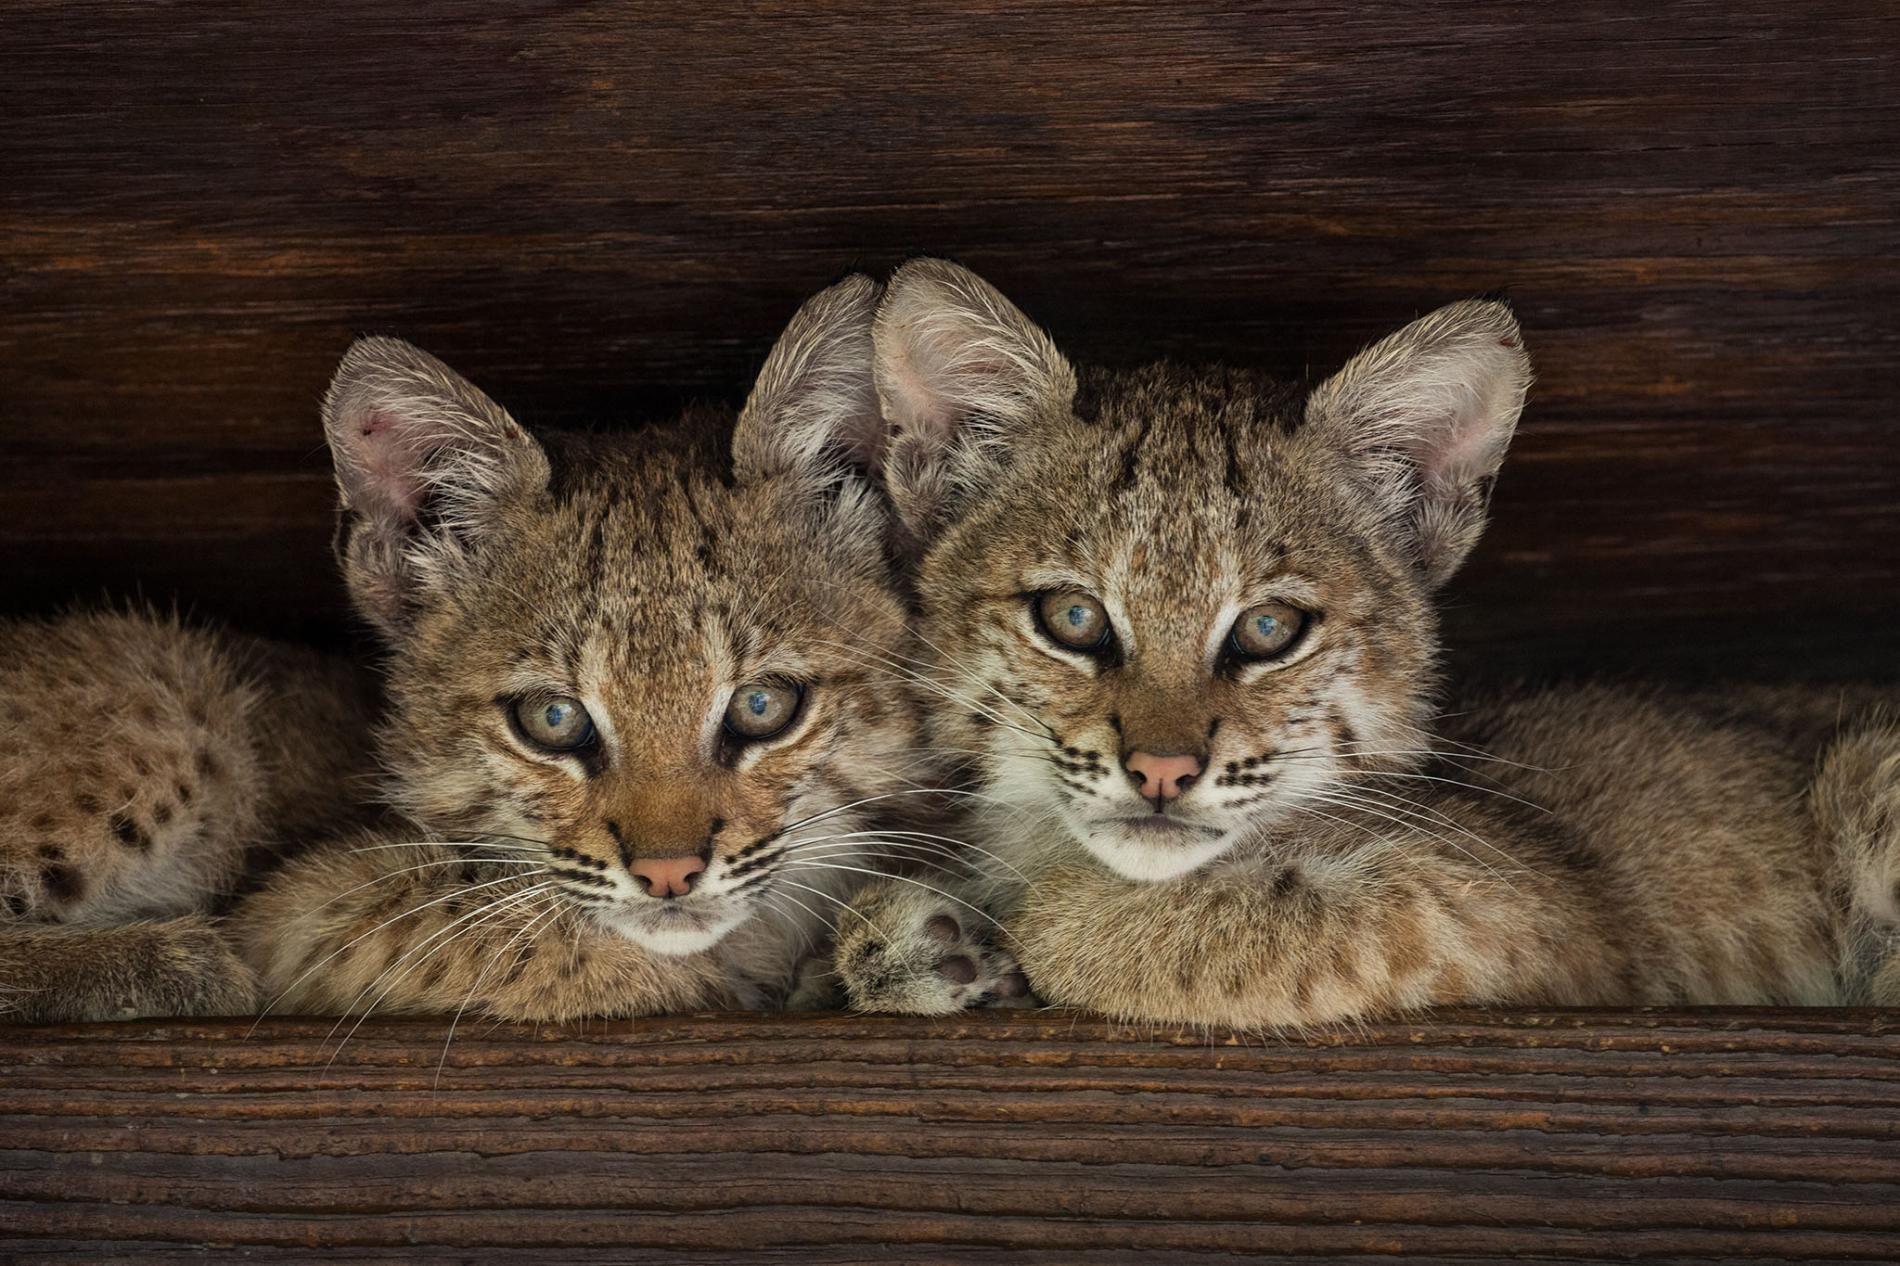 A Rare Look at a Bobcat Family Wild animals photography